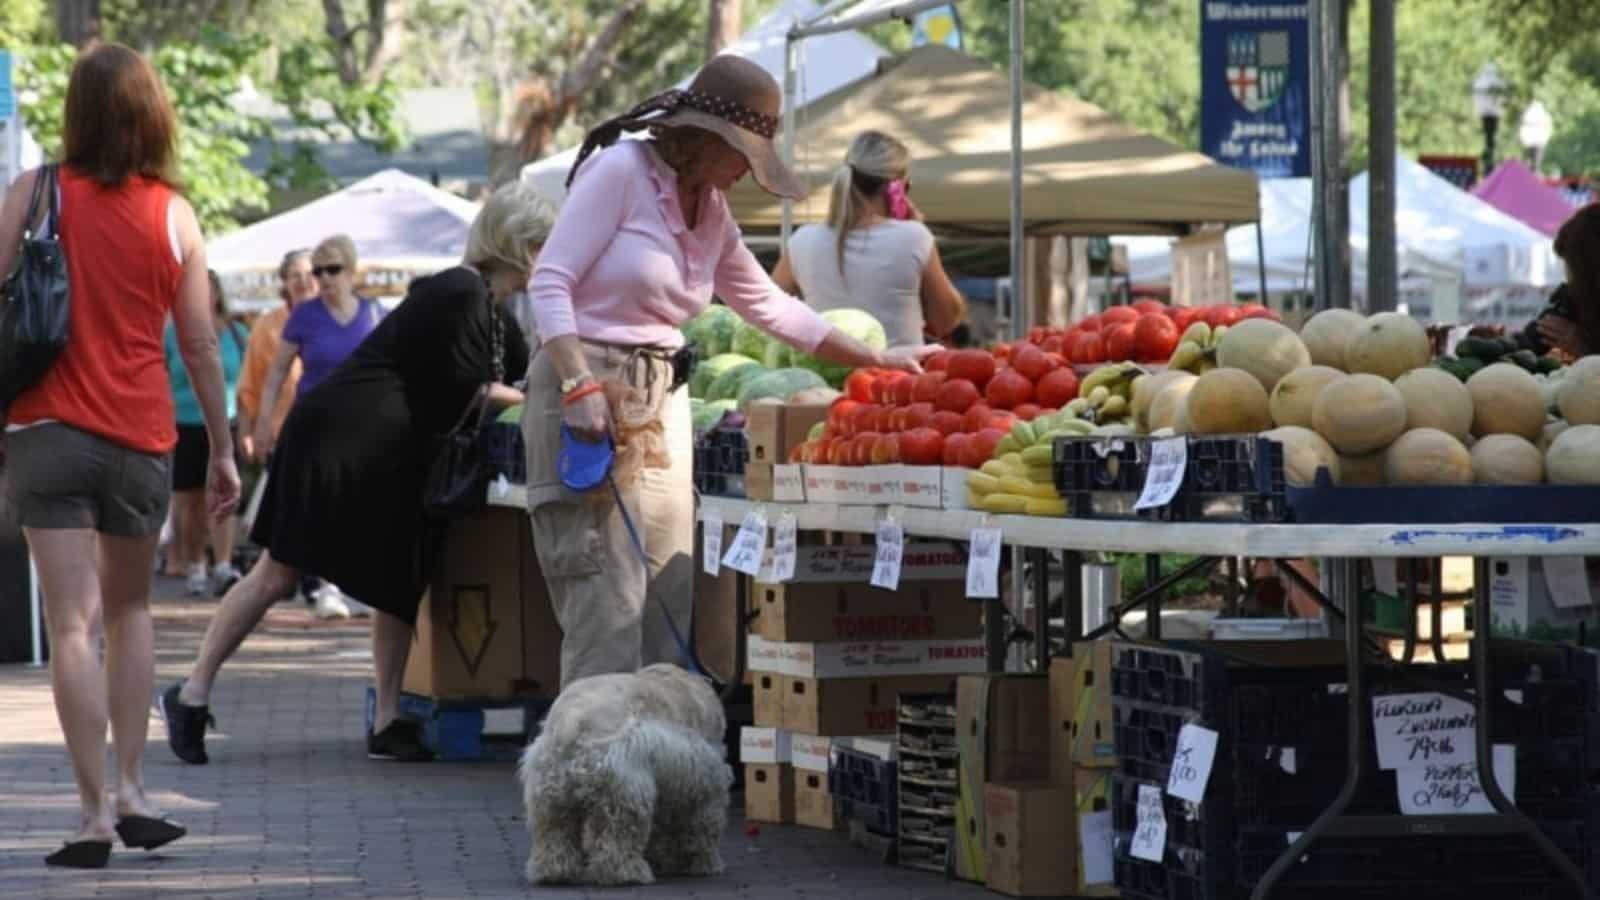 Shoppers attending farmer's market in Windermere Florida